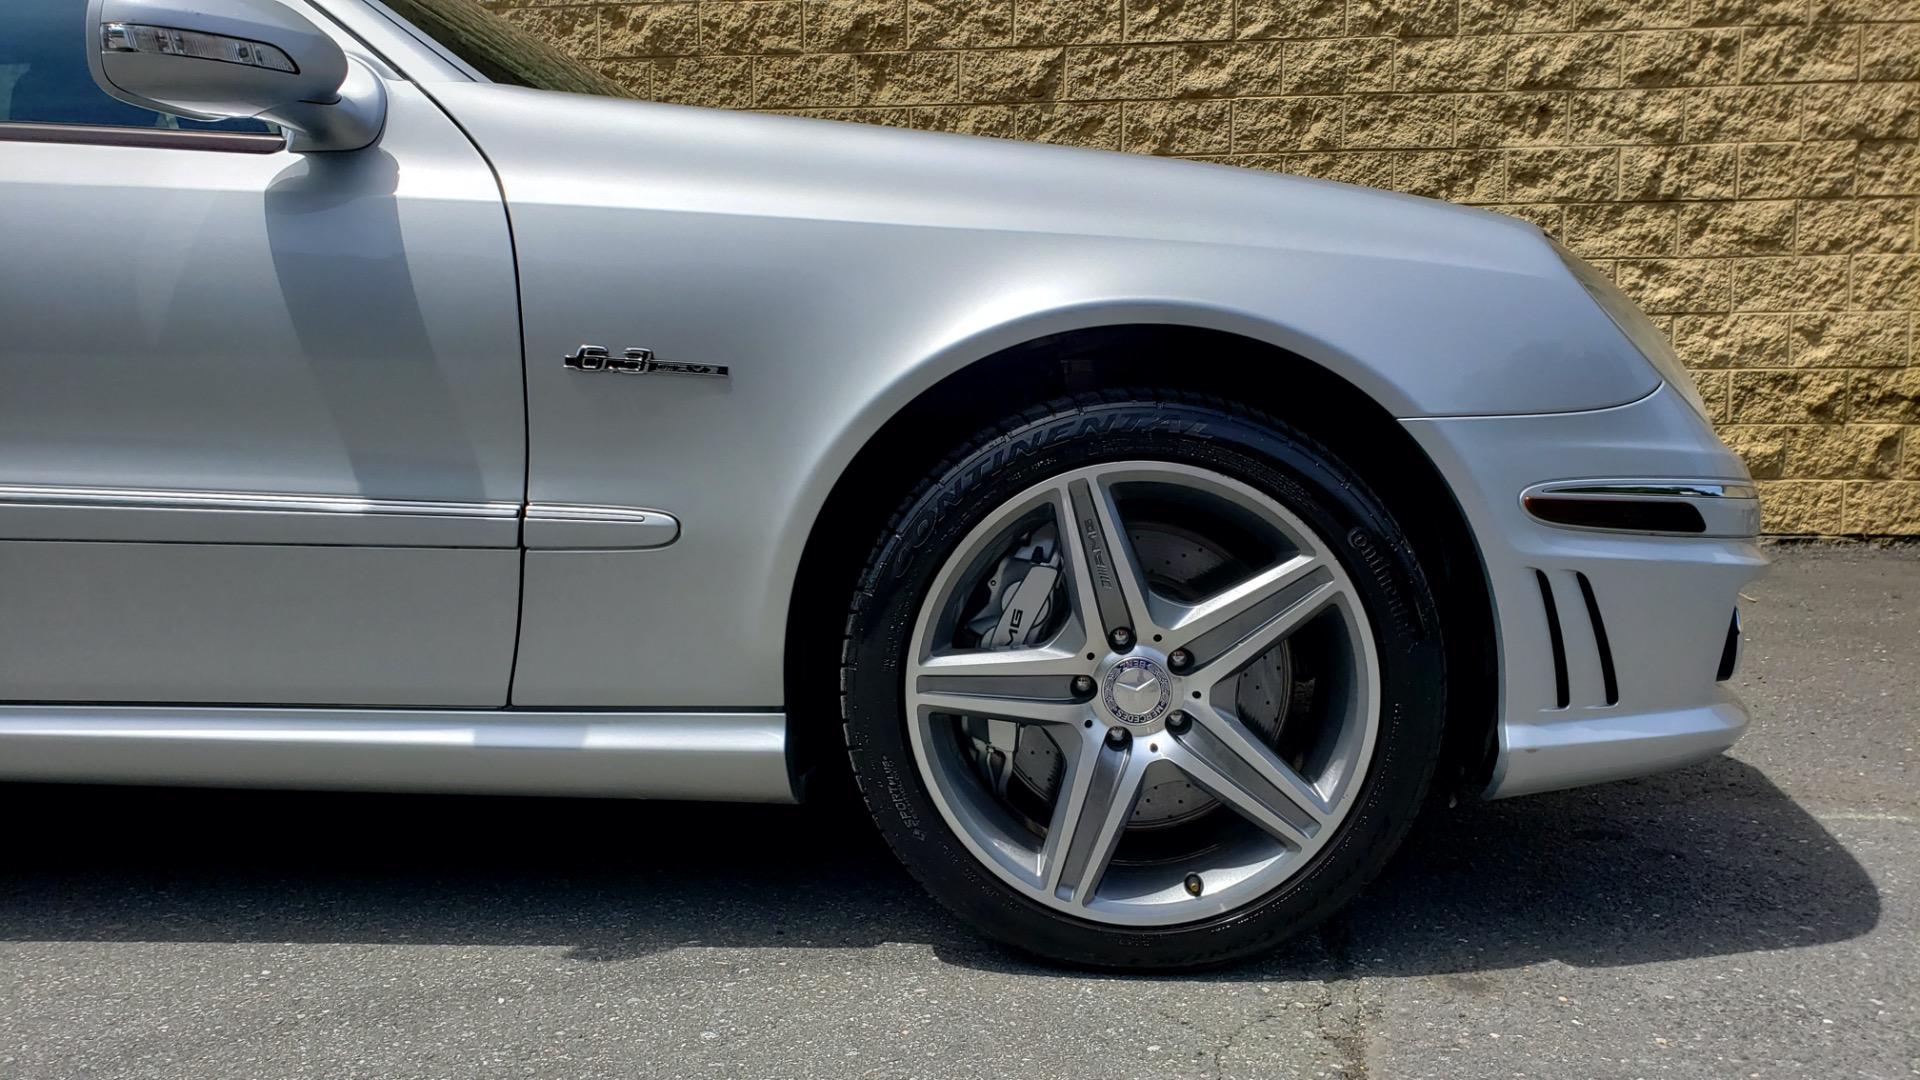 Used 2007 Mercedes-Benz E-Class E63 AMG WAGON / NAV / SUNROOF / HARMAN/KARDON for sale $29,000 at Formula Imports in Charlotte NC 28227 85